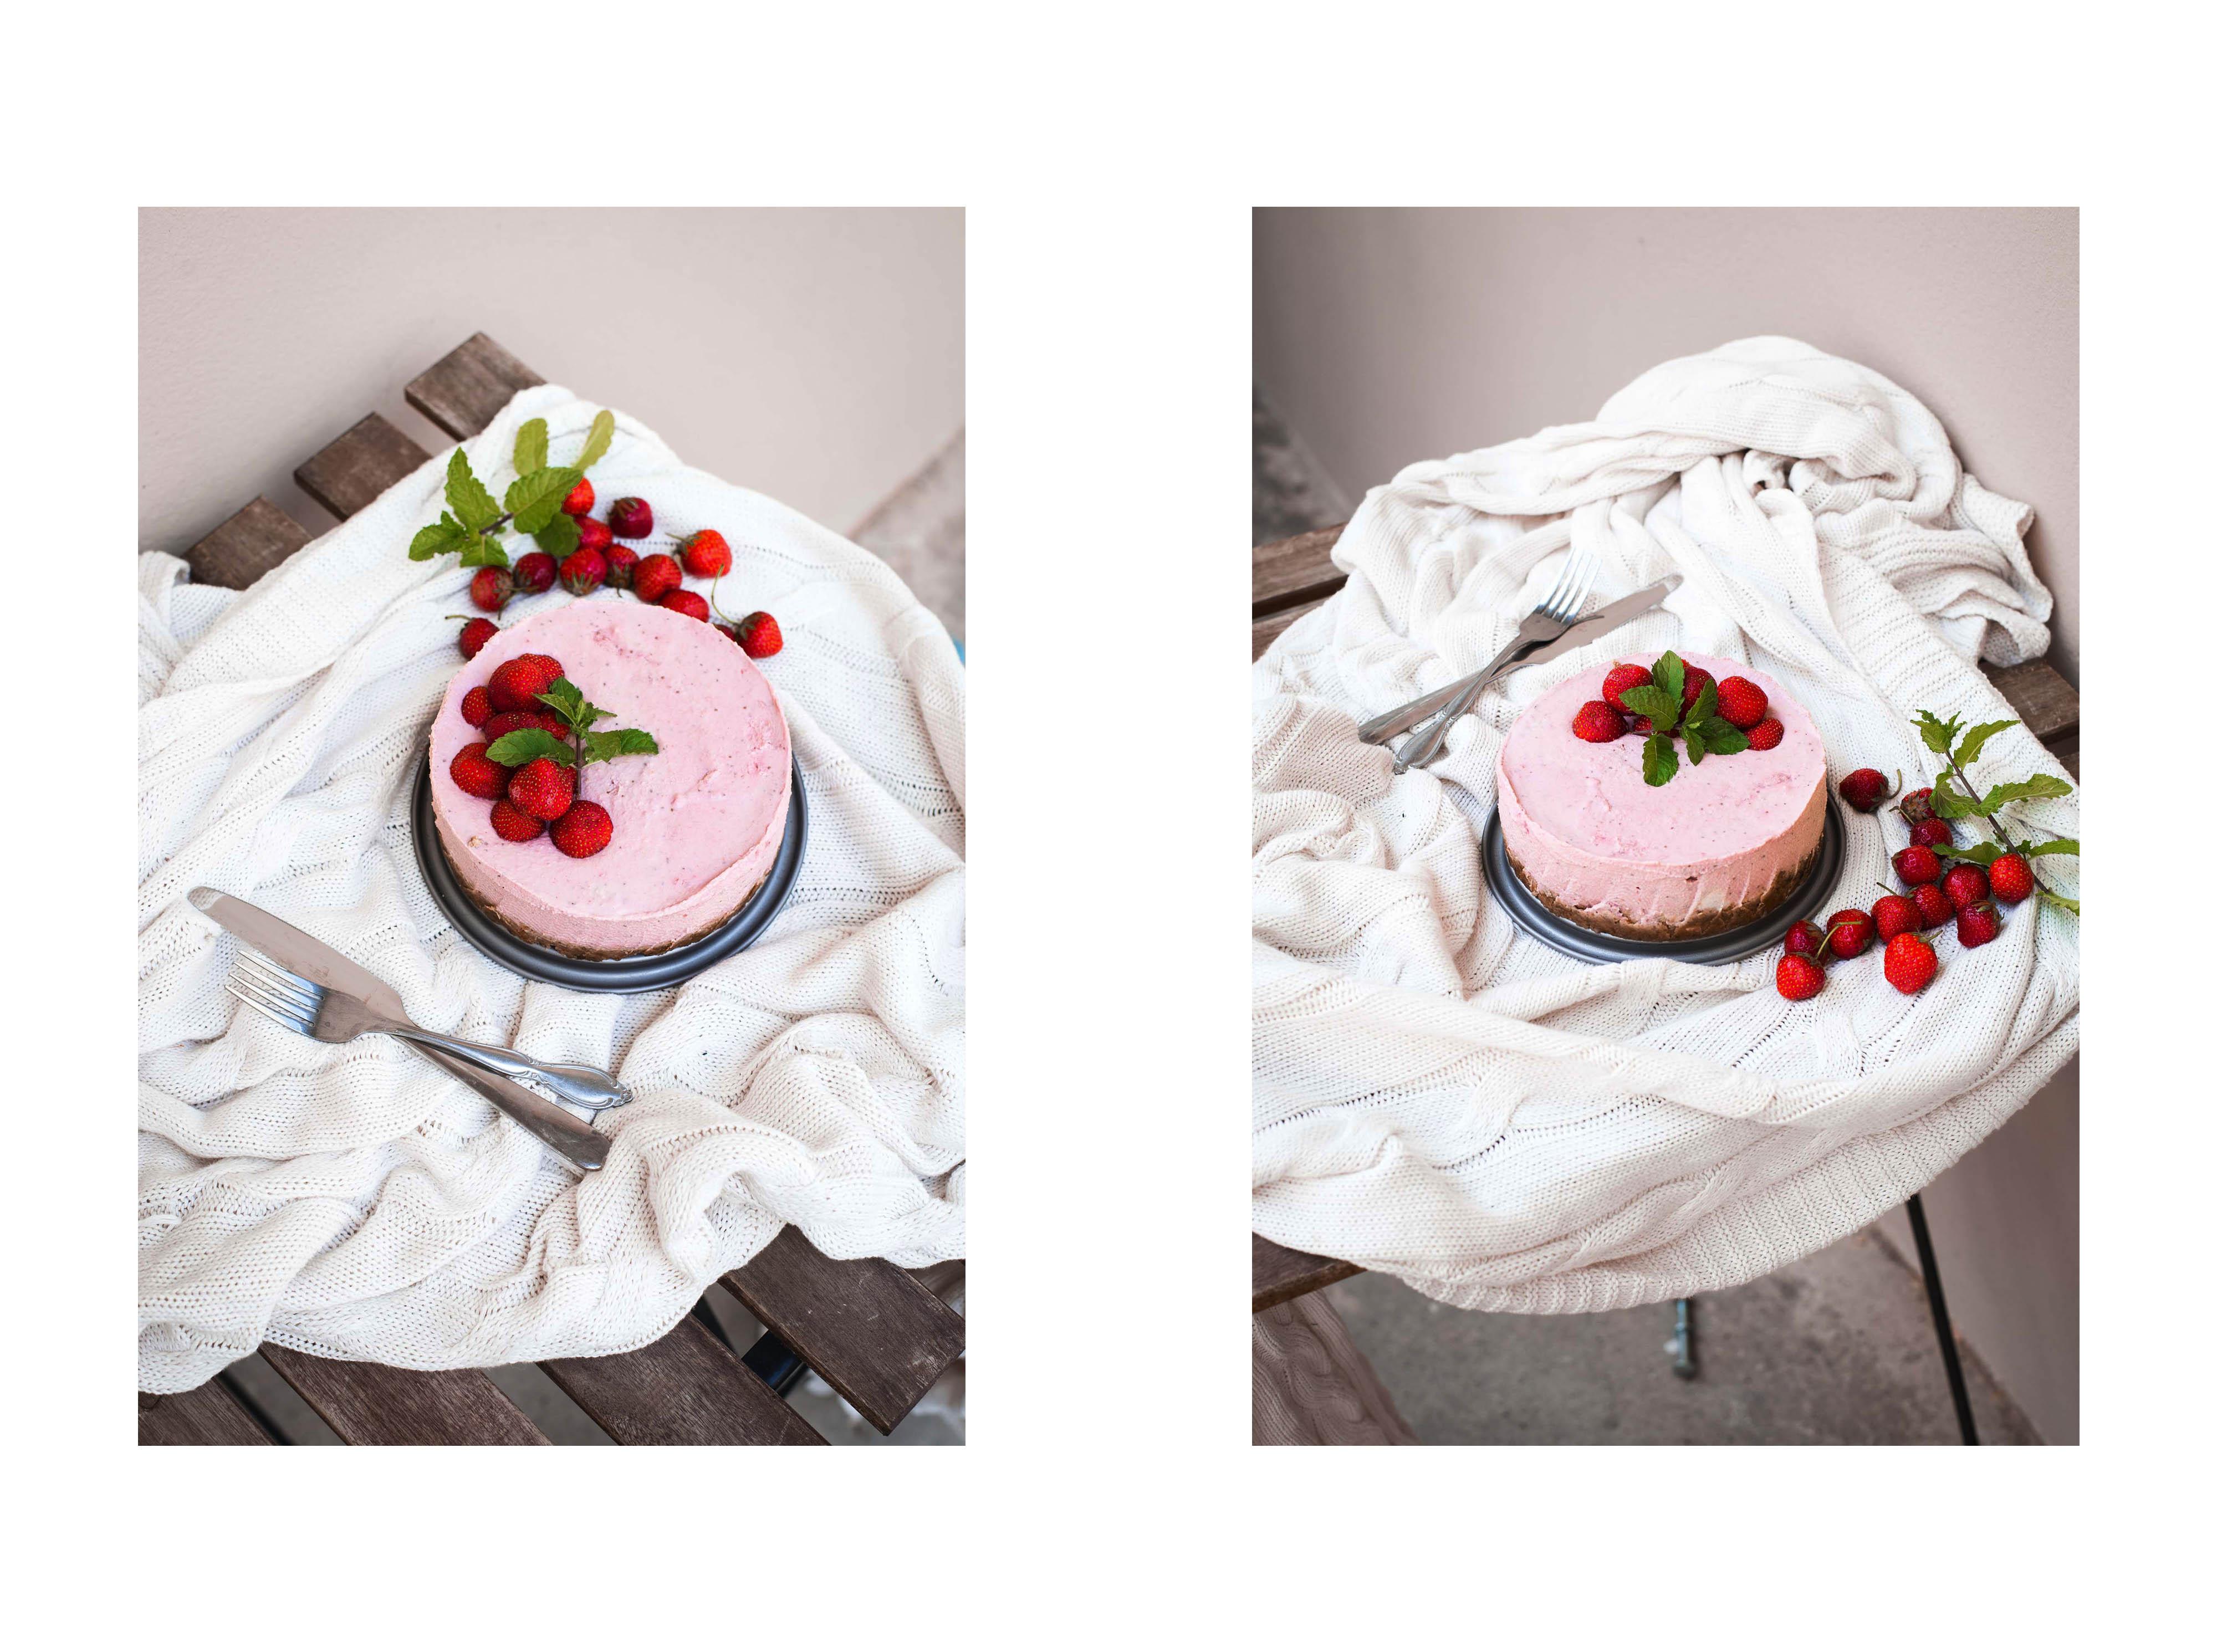 raw vegan strawberry cheesecake cashews father's day present walnuts sugar-free gluten-free